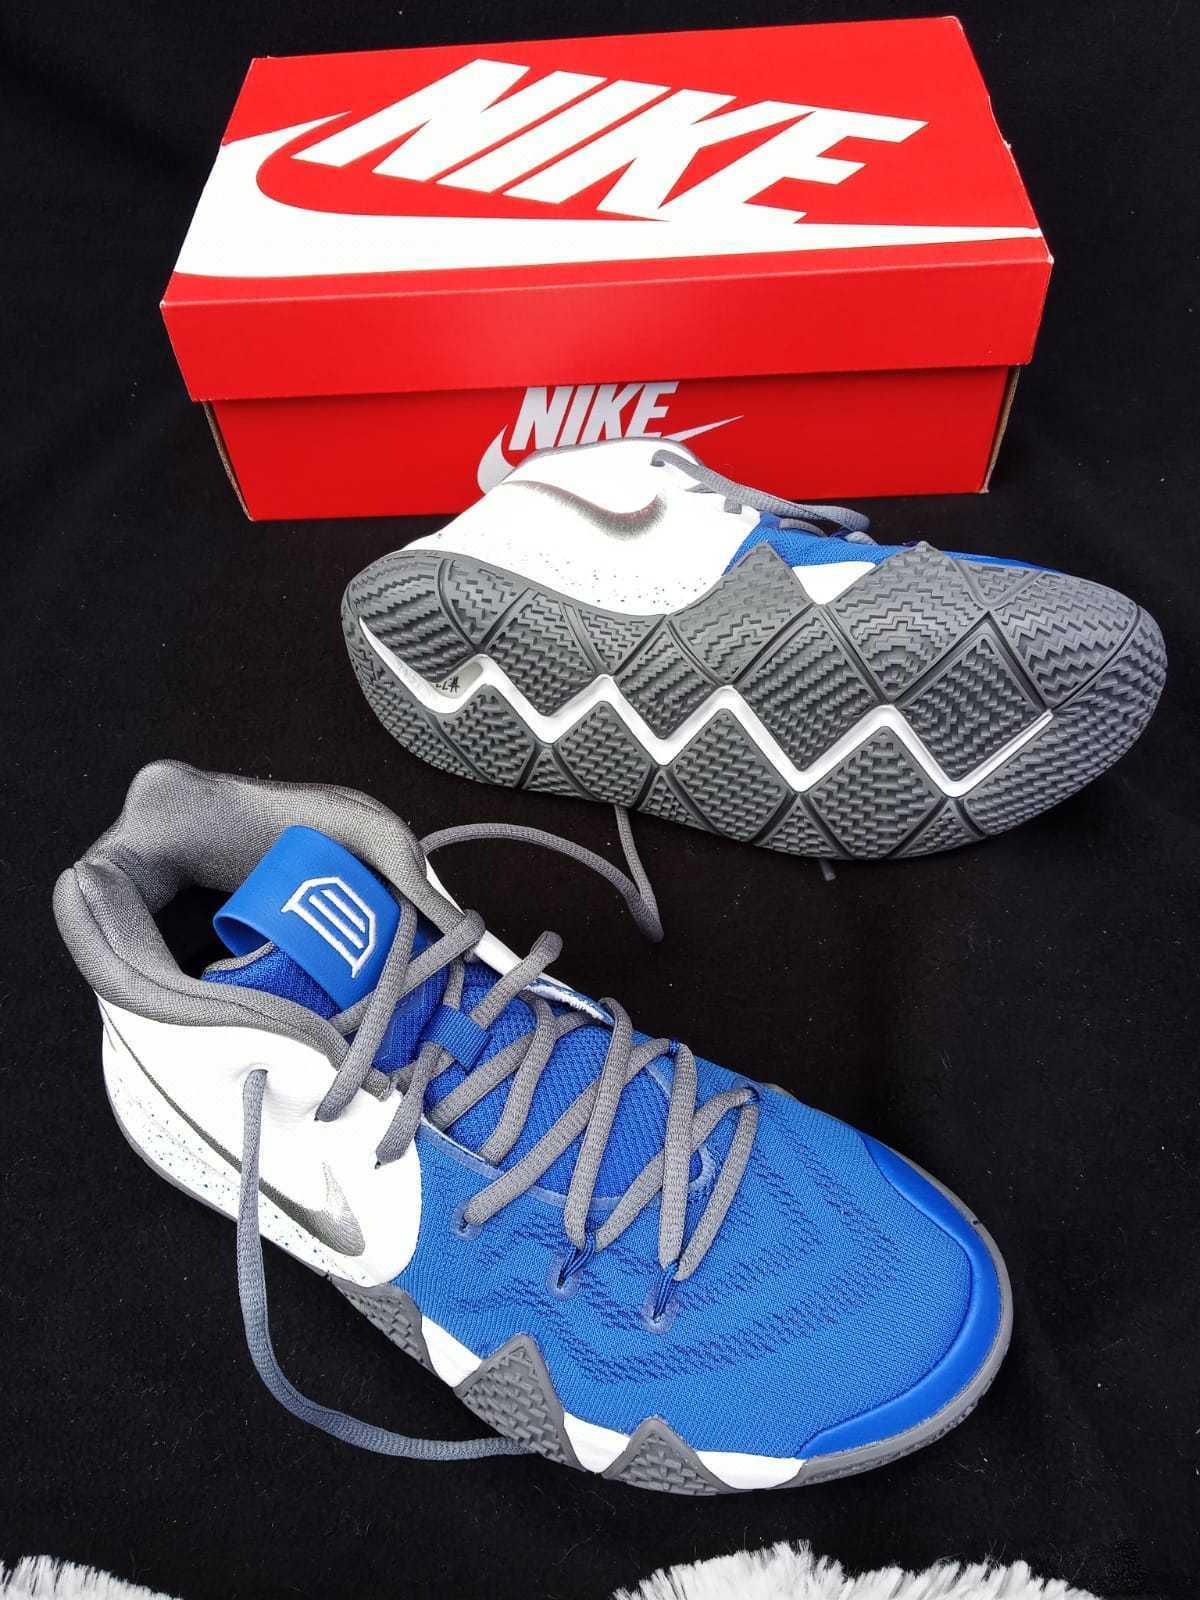 7.5 para hombre NIKE KYRIE IRVING ID Baloncesto Zapatos Zapatillas AR3867-994 Azul blancoooo